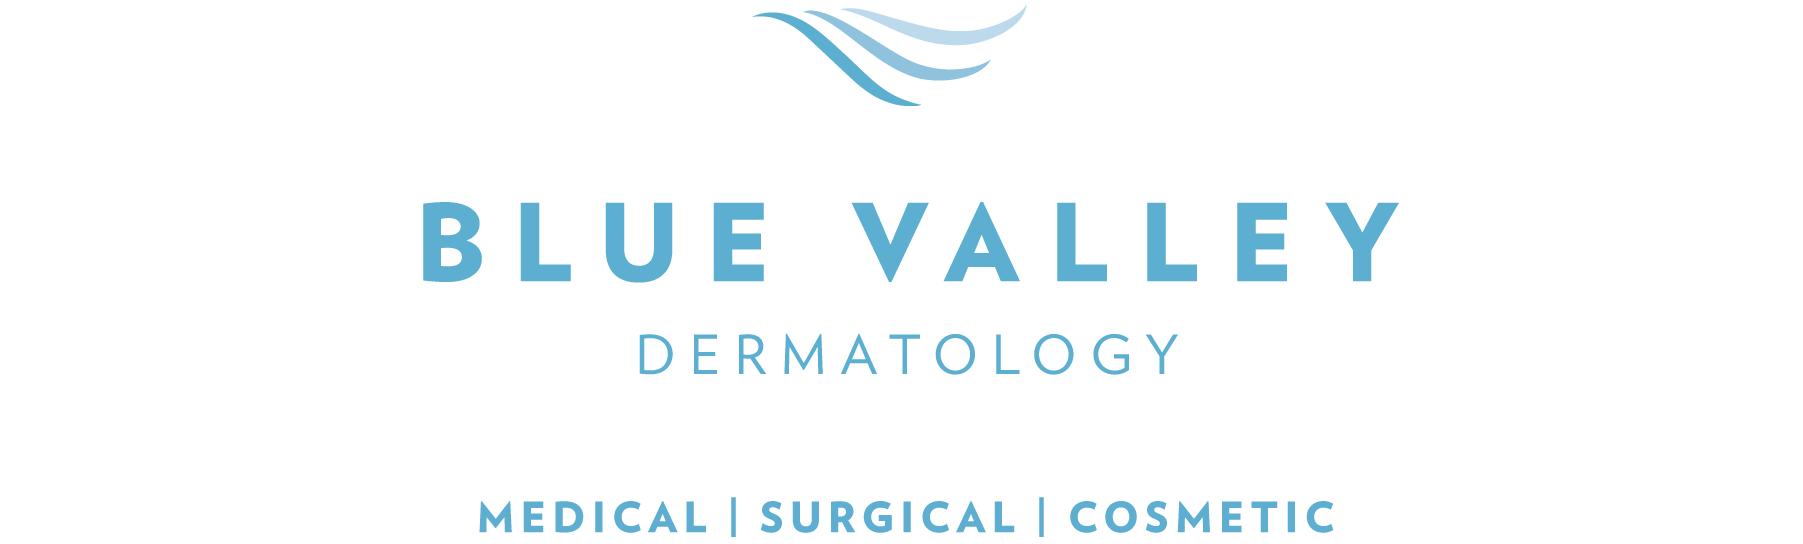 Blue Valley Dermatology Best Dermatology office in Johnson county